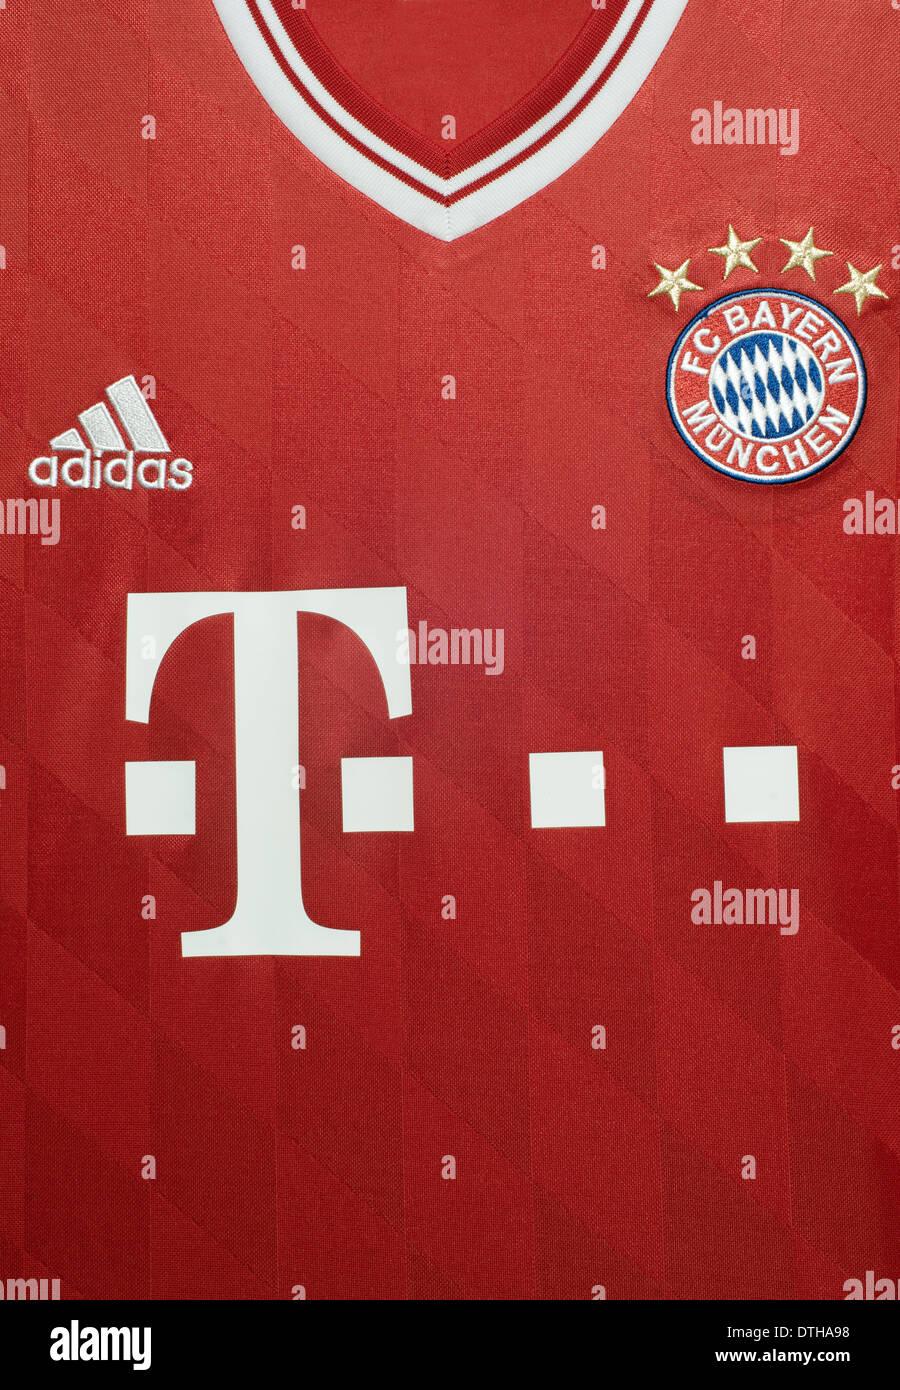 Chiusura del FC Bayern Munchen kit squadra Foto stock - Alamy